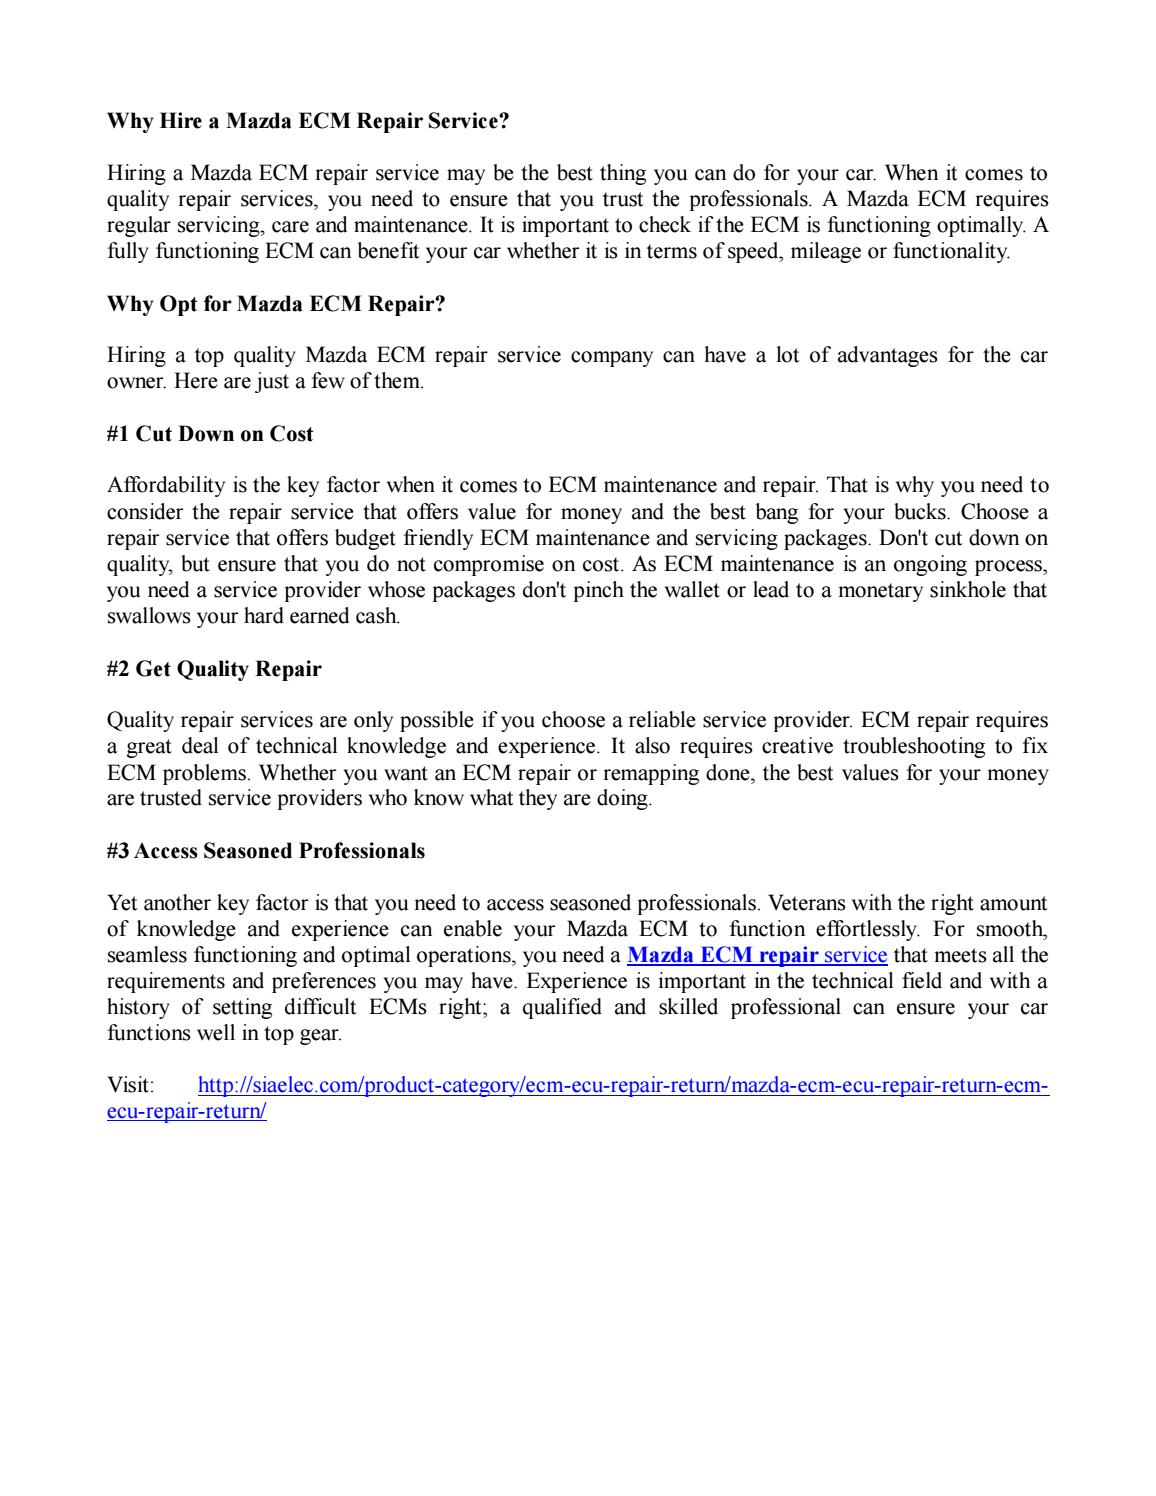 Hire A Mazda Ecm Repair Service By Sia Electronics Issuu